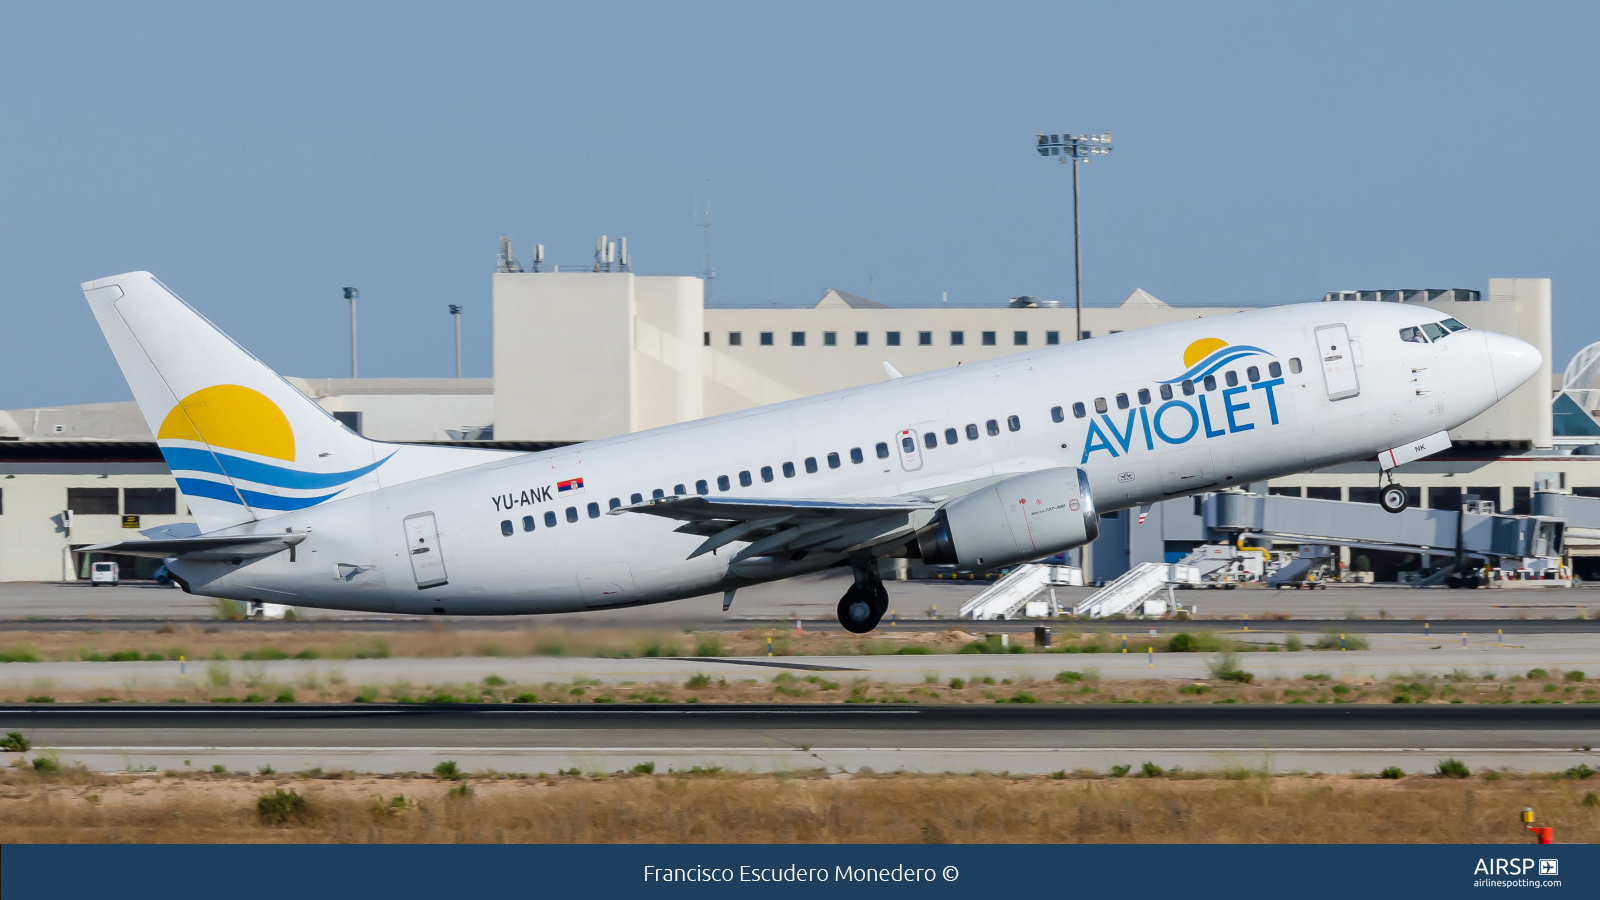 Aviolet  Boeing 737-300  YU-ANK